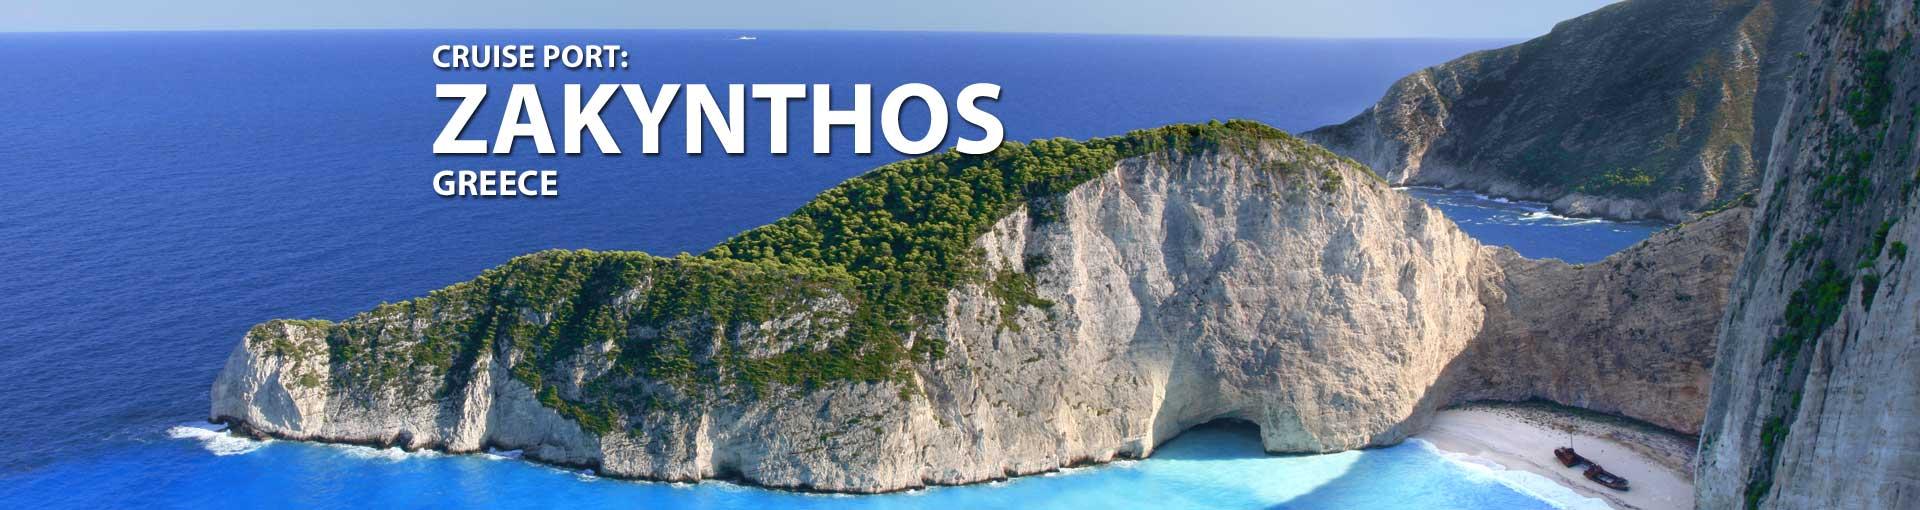 Cruises to Zakynthos, Greece